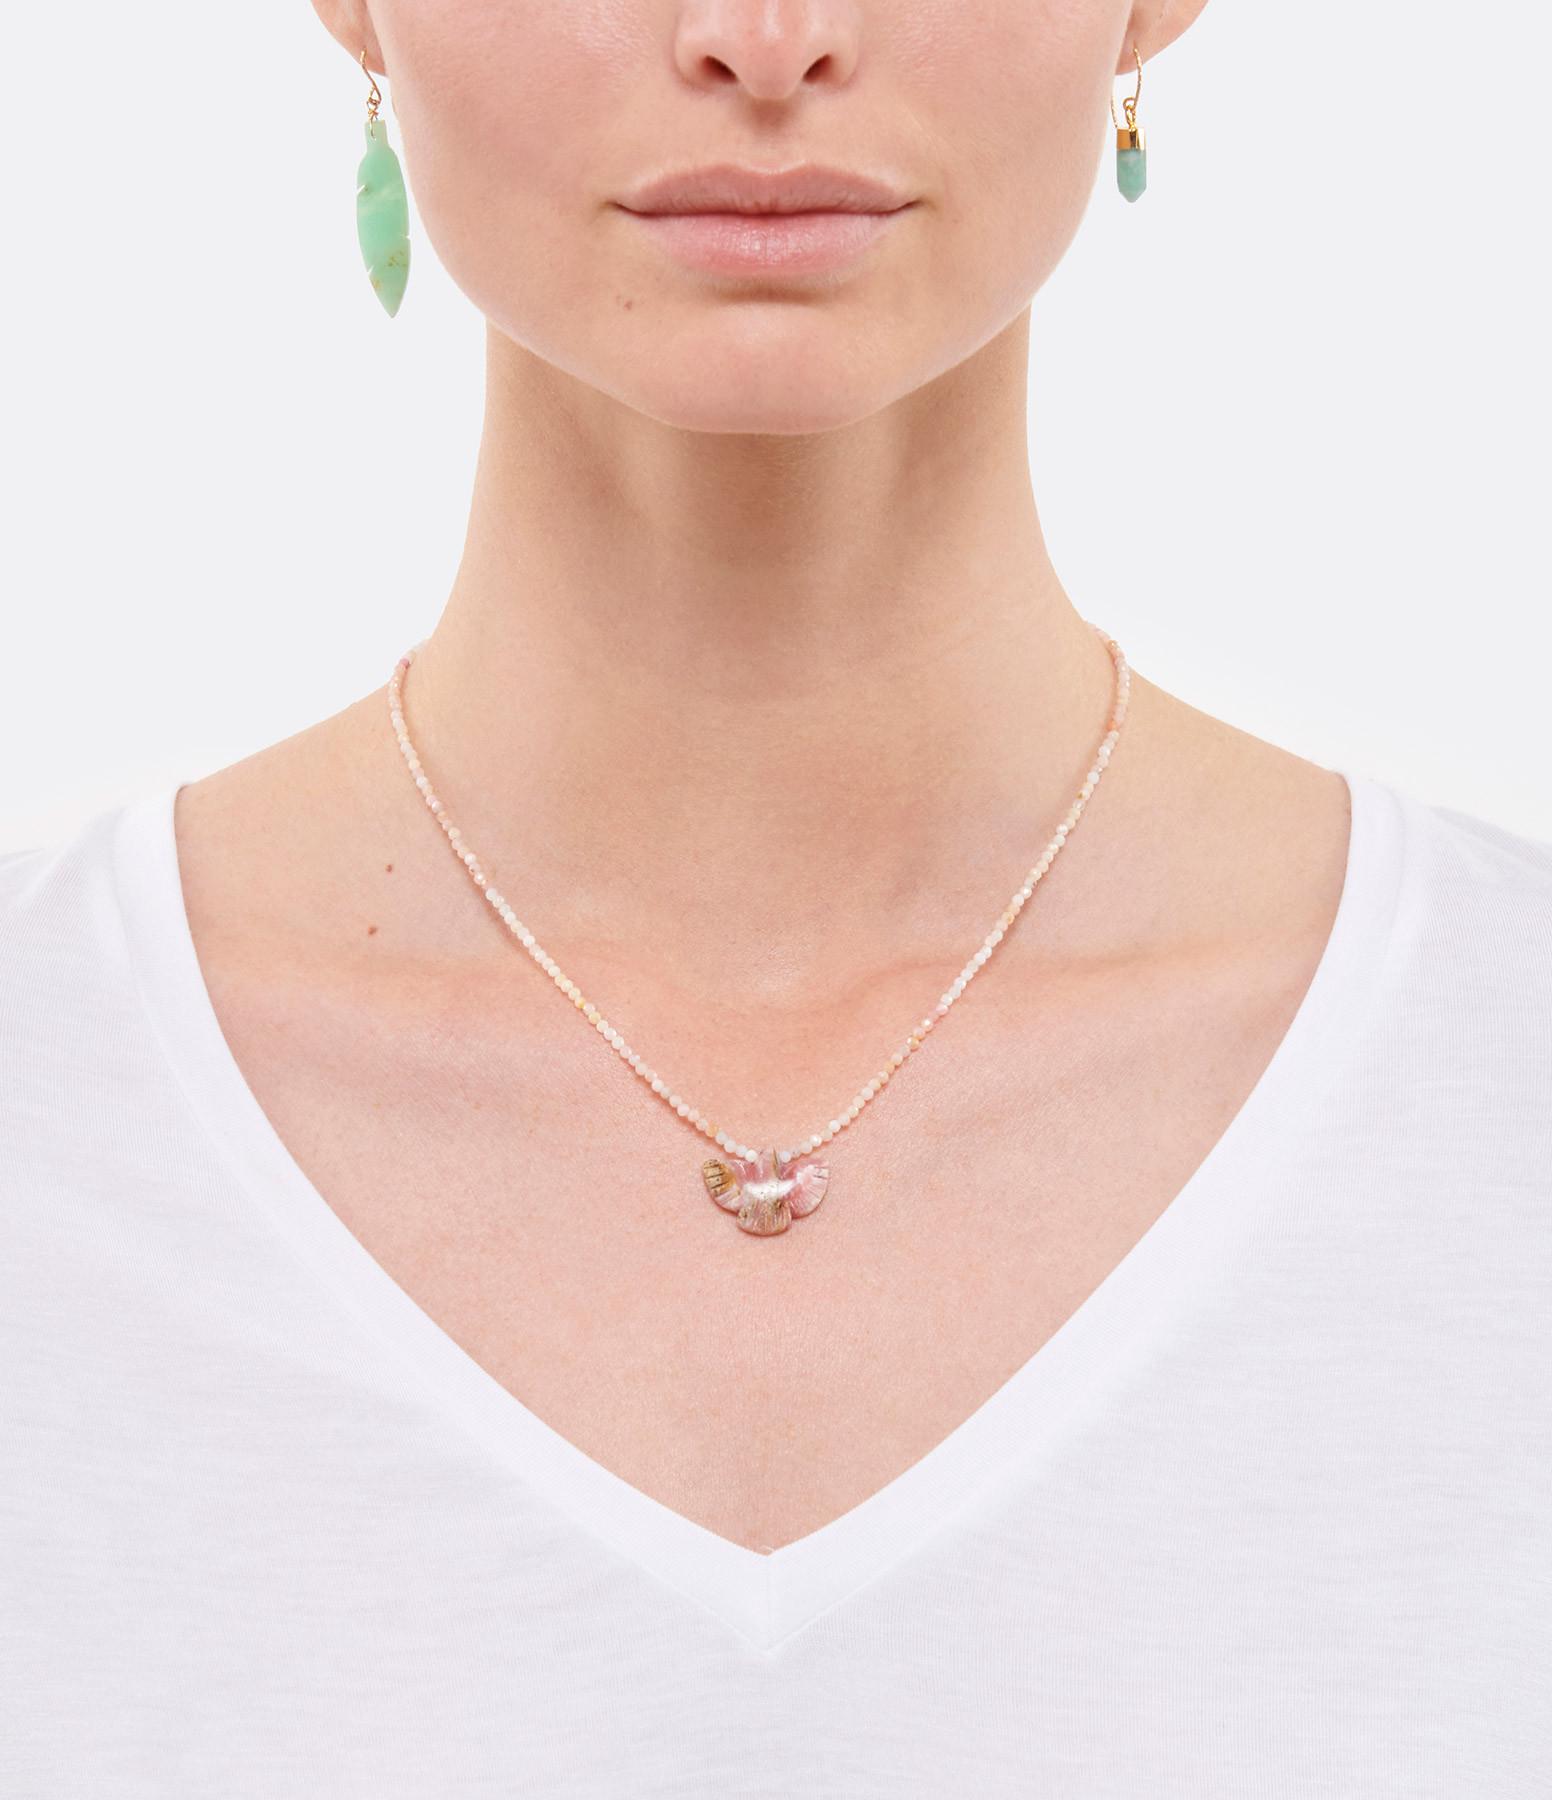 MON PRECIEUX GEM - Collier Condor Perles Opale Rose